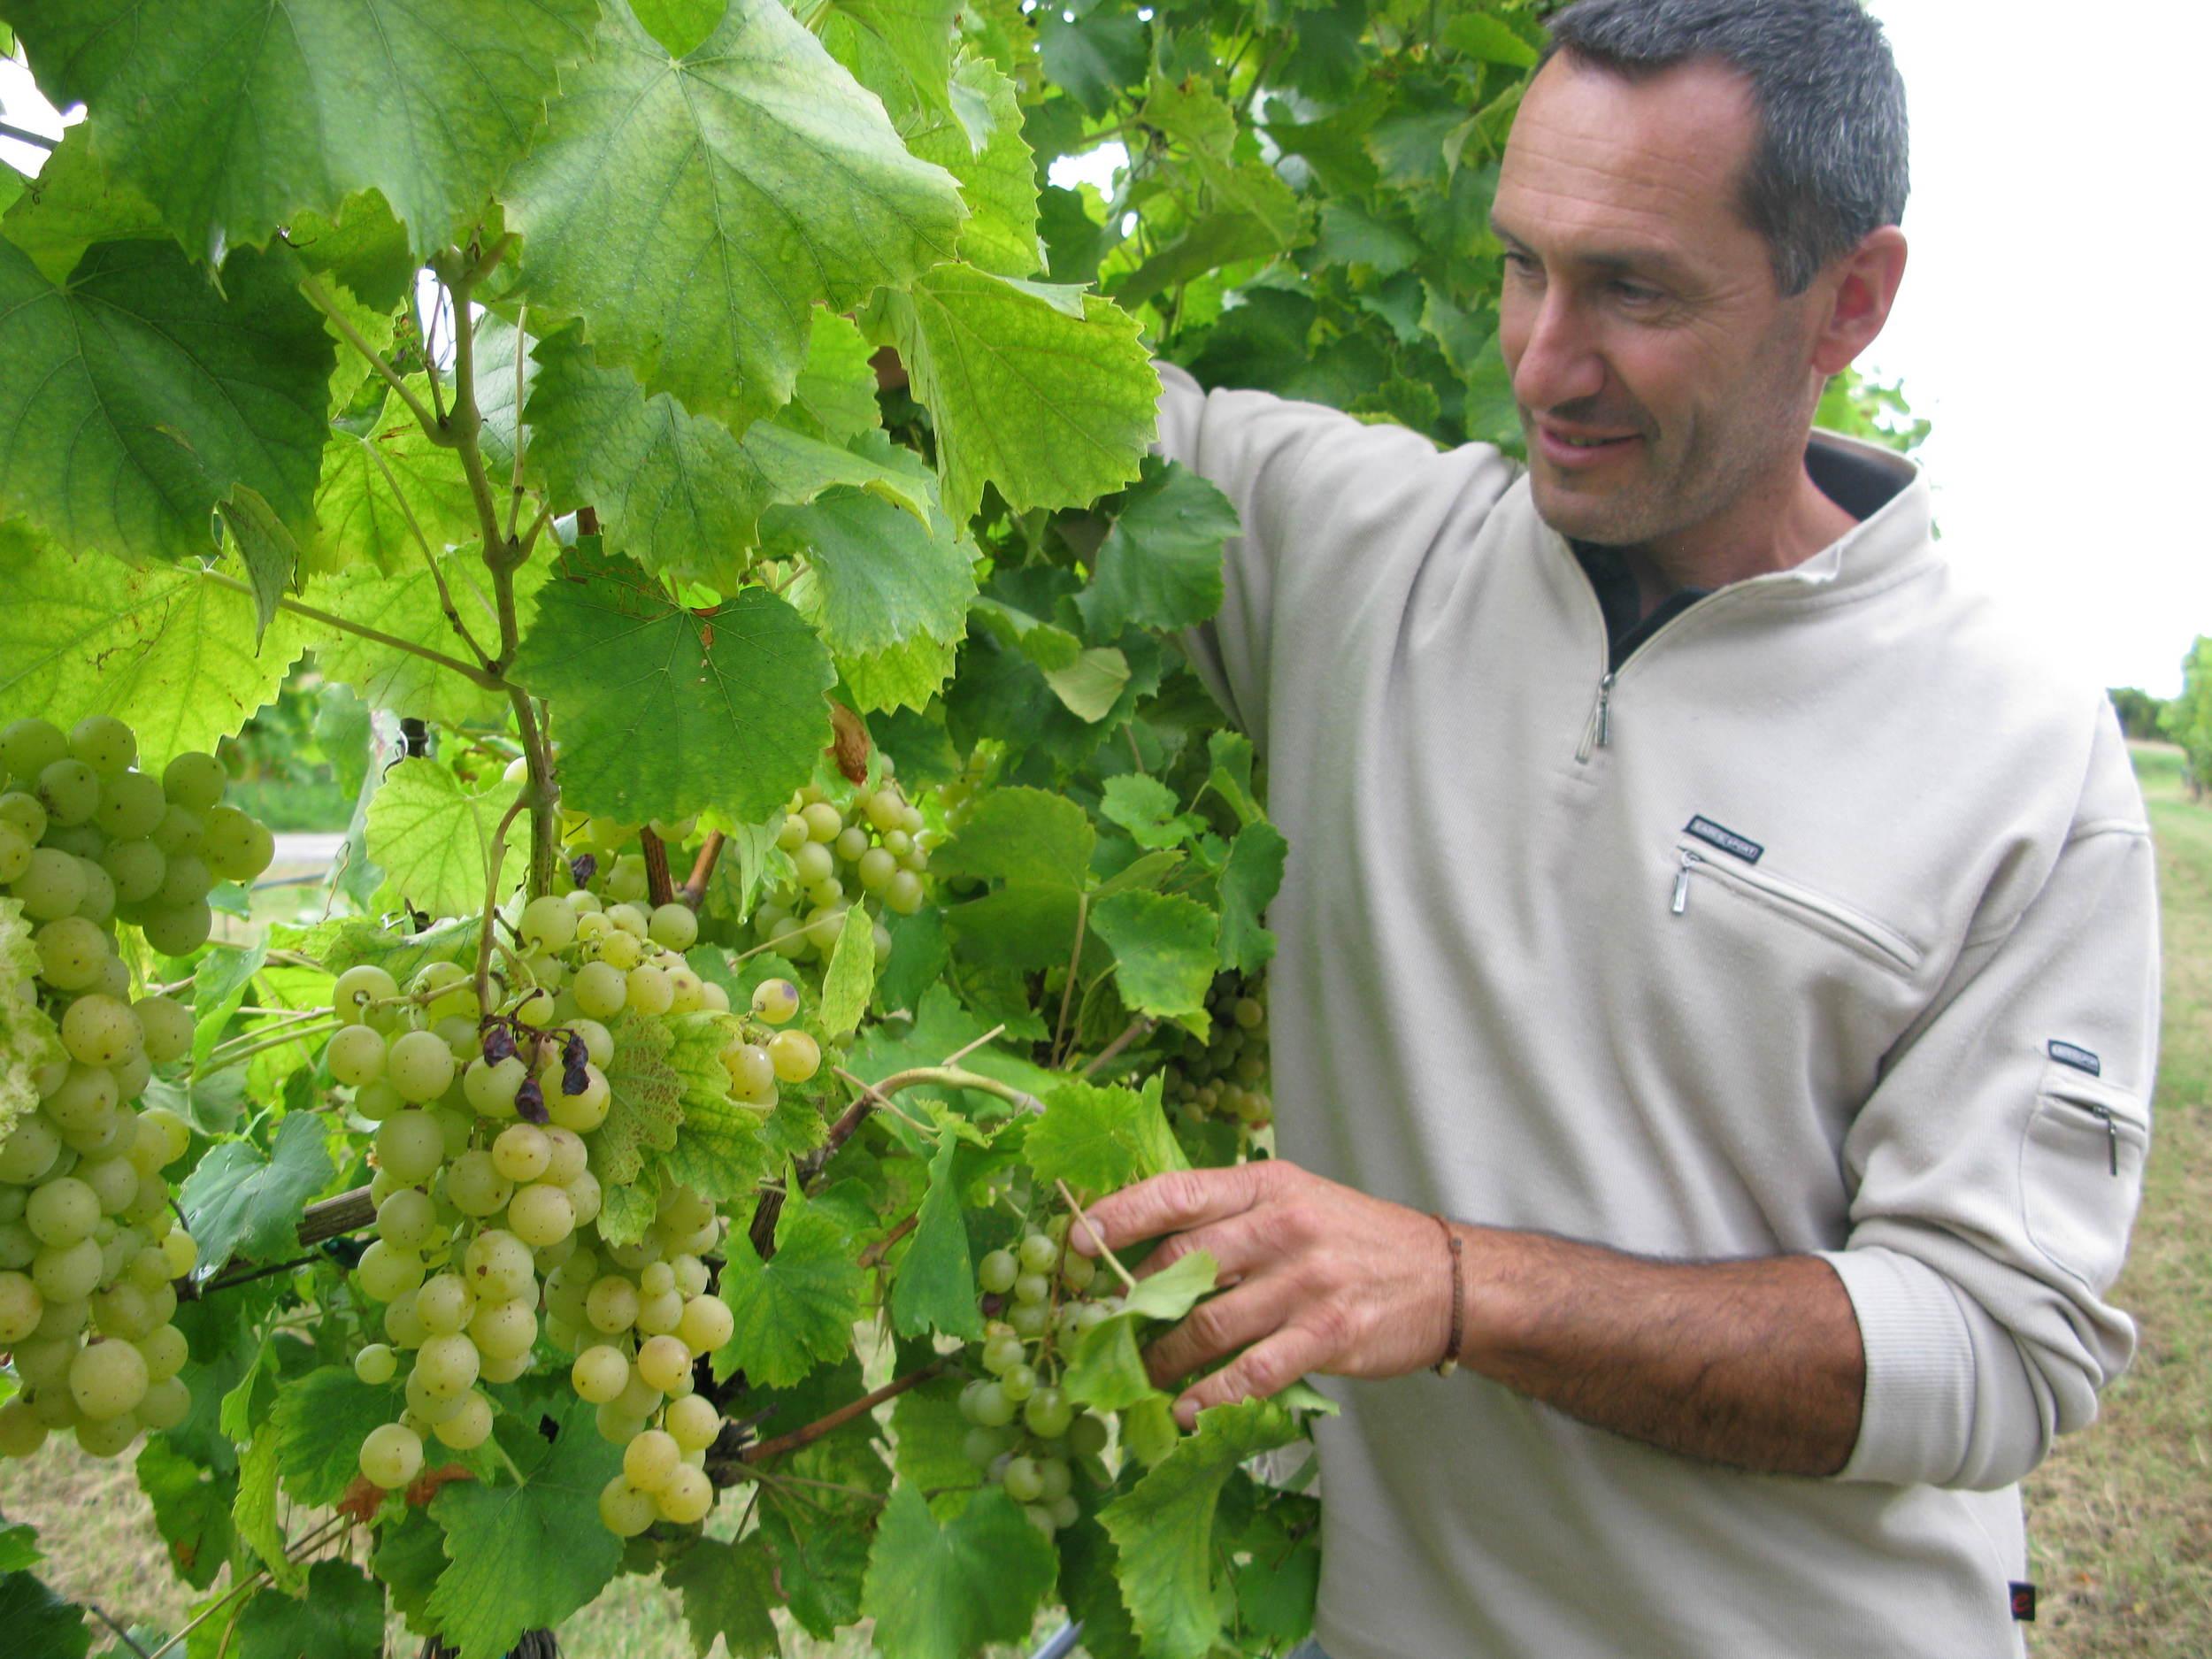 Winemaker Mauro Altini